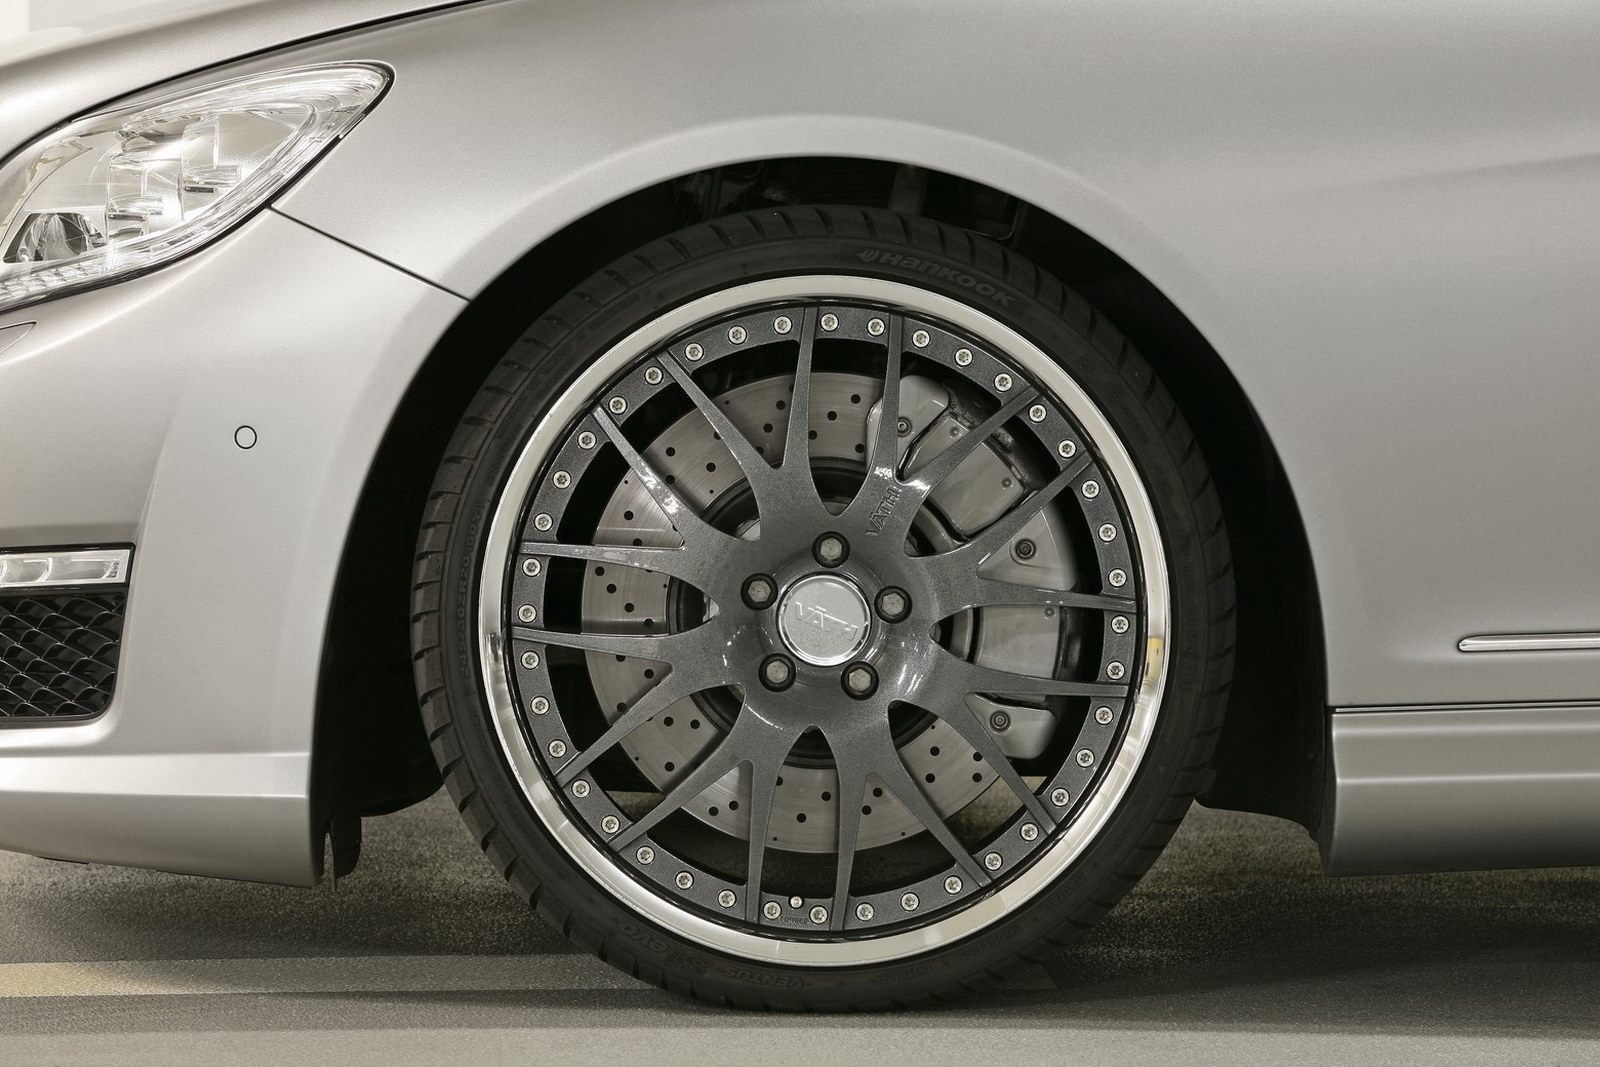 Mercedes-Bent CL 63 AMG a nárust výkonu od Väth 3